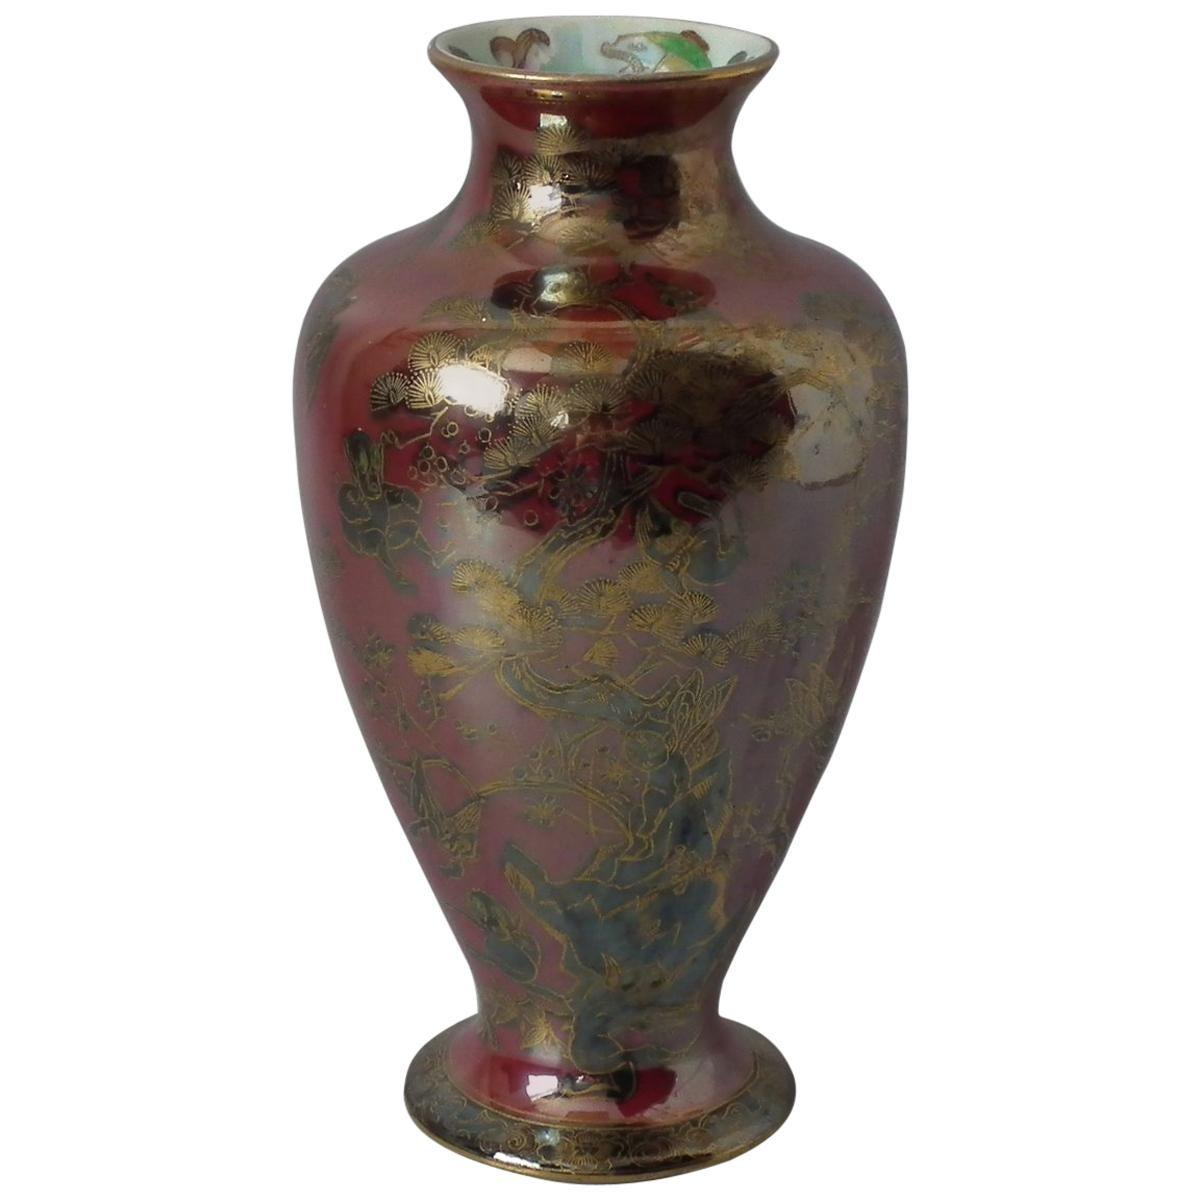 Wedgwood Fairyland Lustre Vase